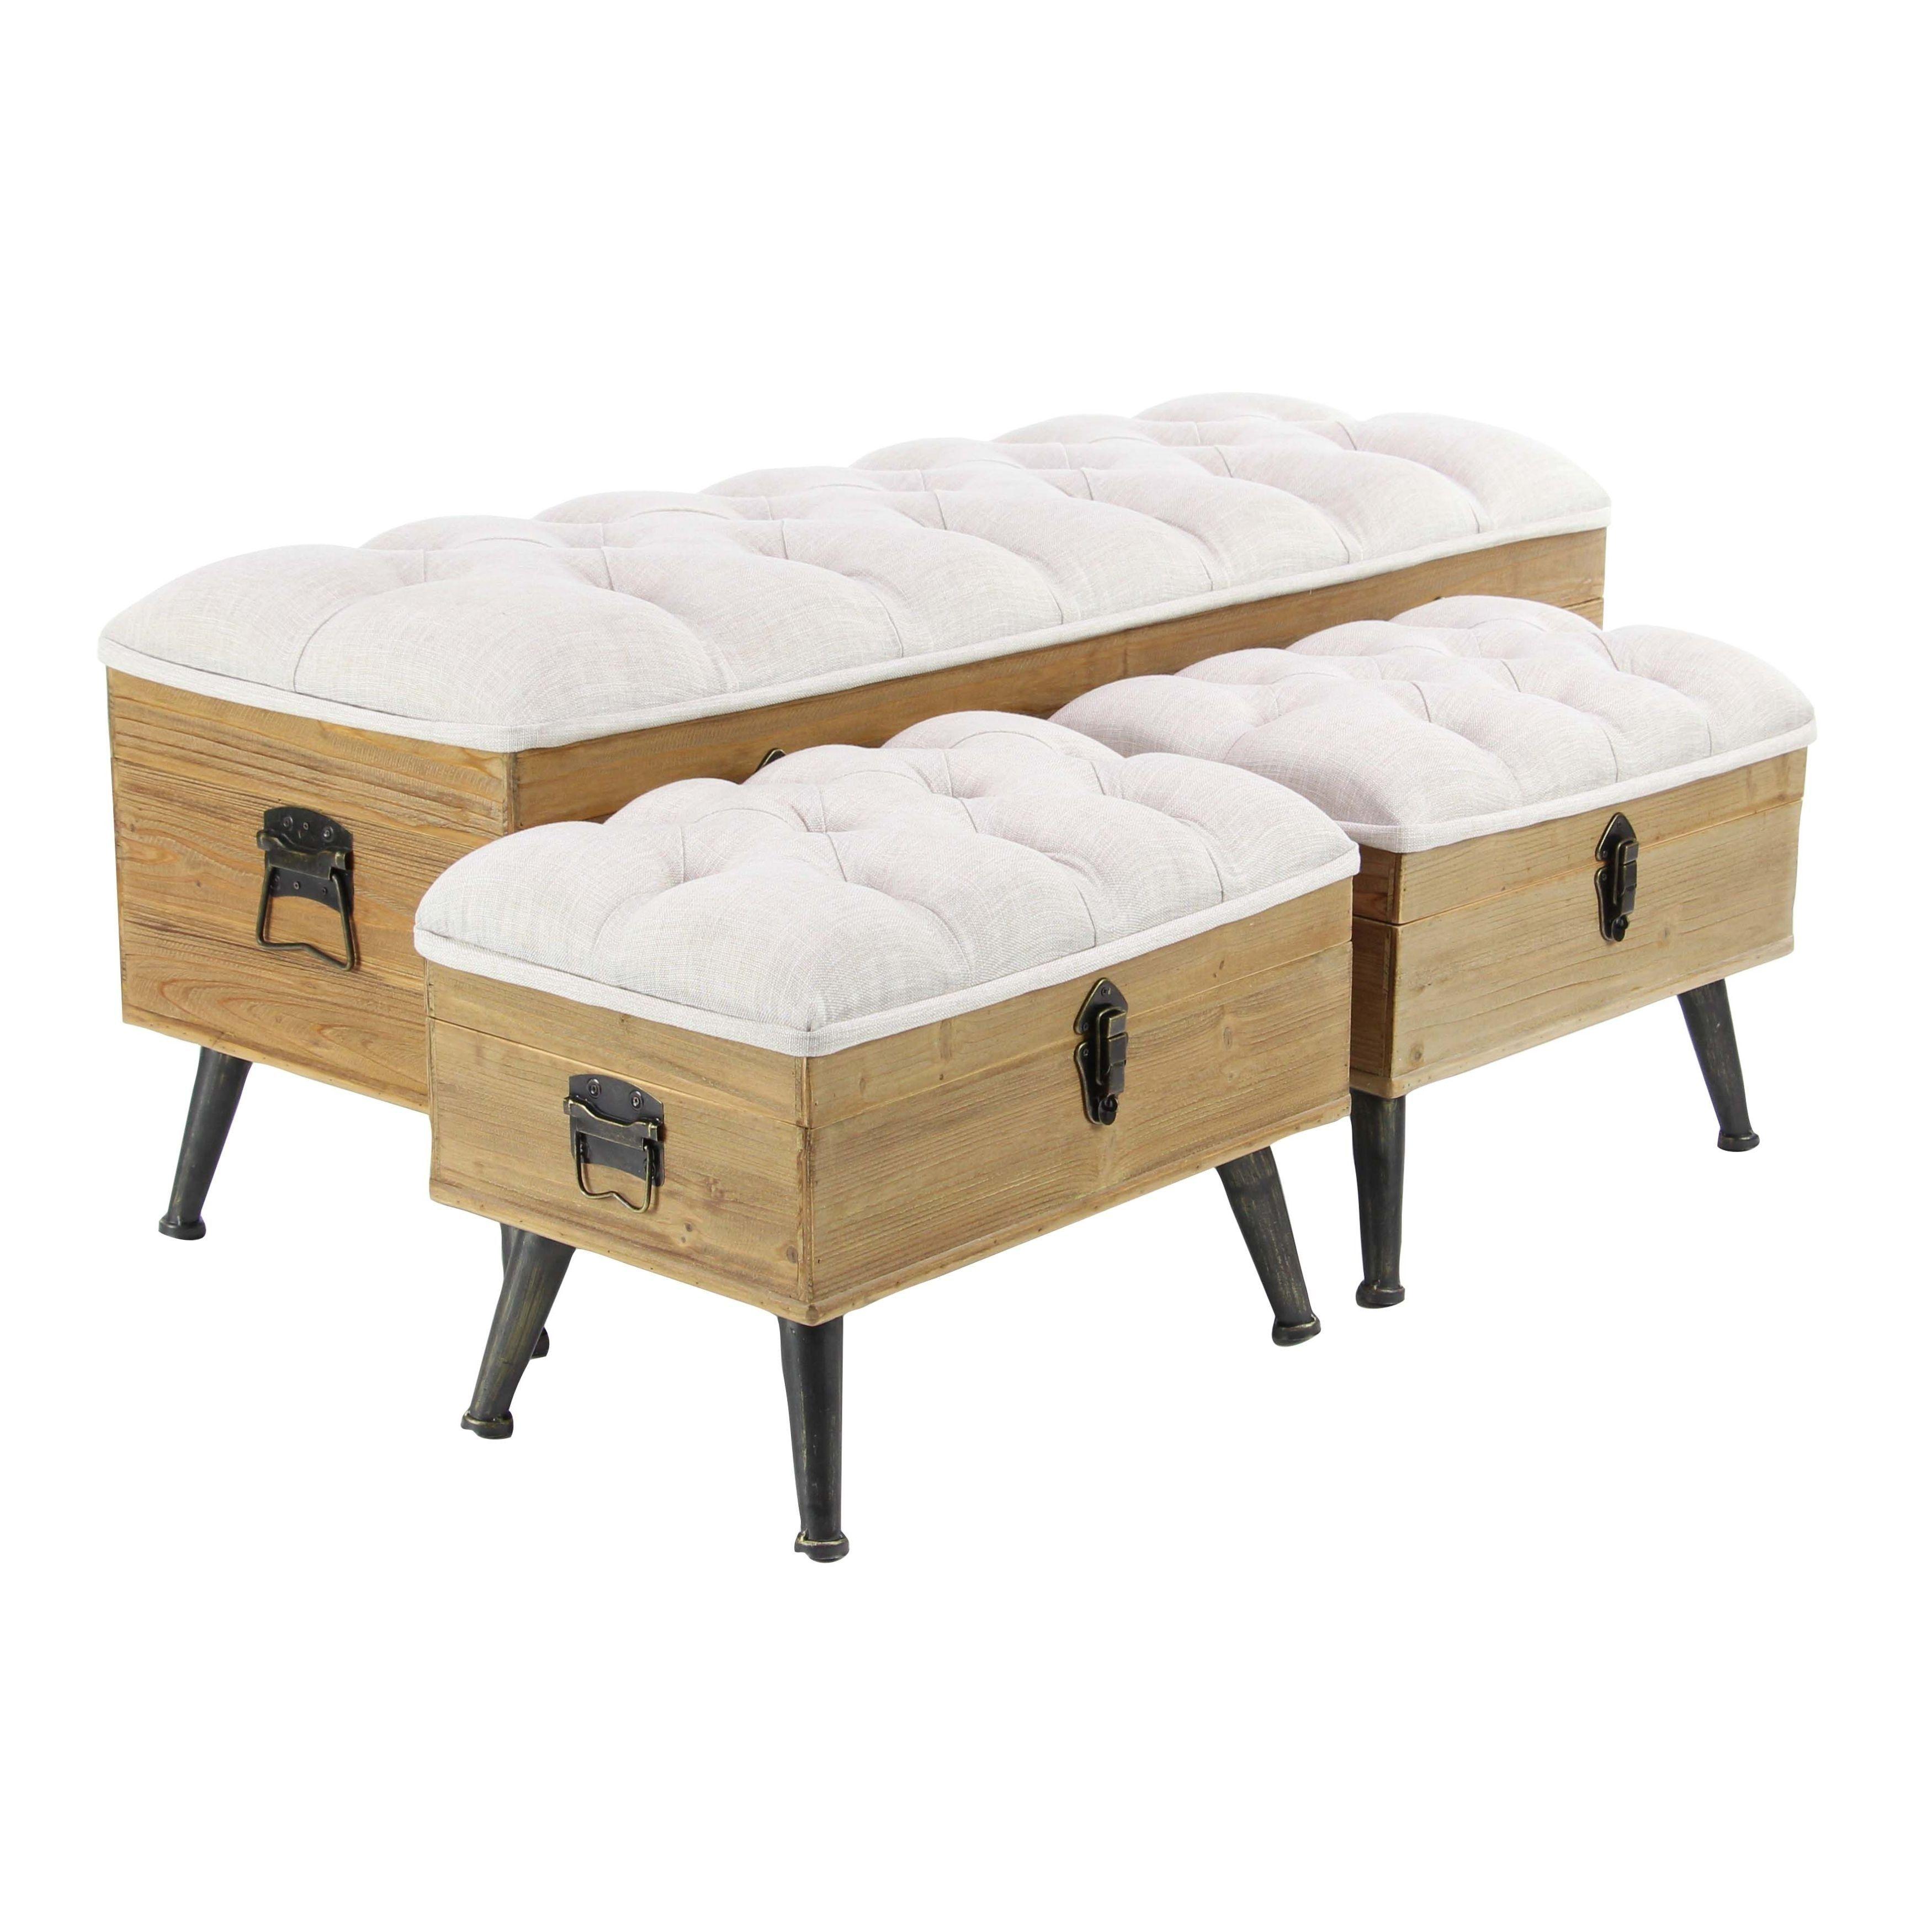 Superb Studio 350 White Wood Assorted Upholstered Storage Benches Inzonedesignstudio Interior Chair Design Inzonedesignstudiocom